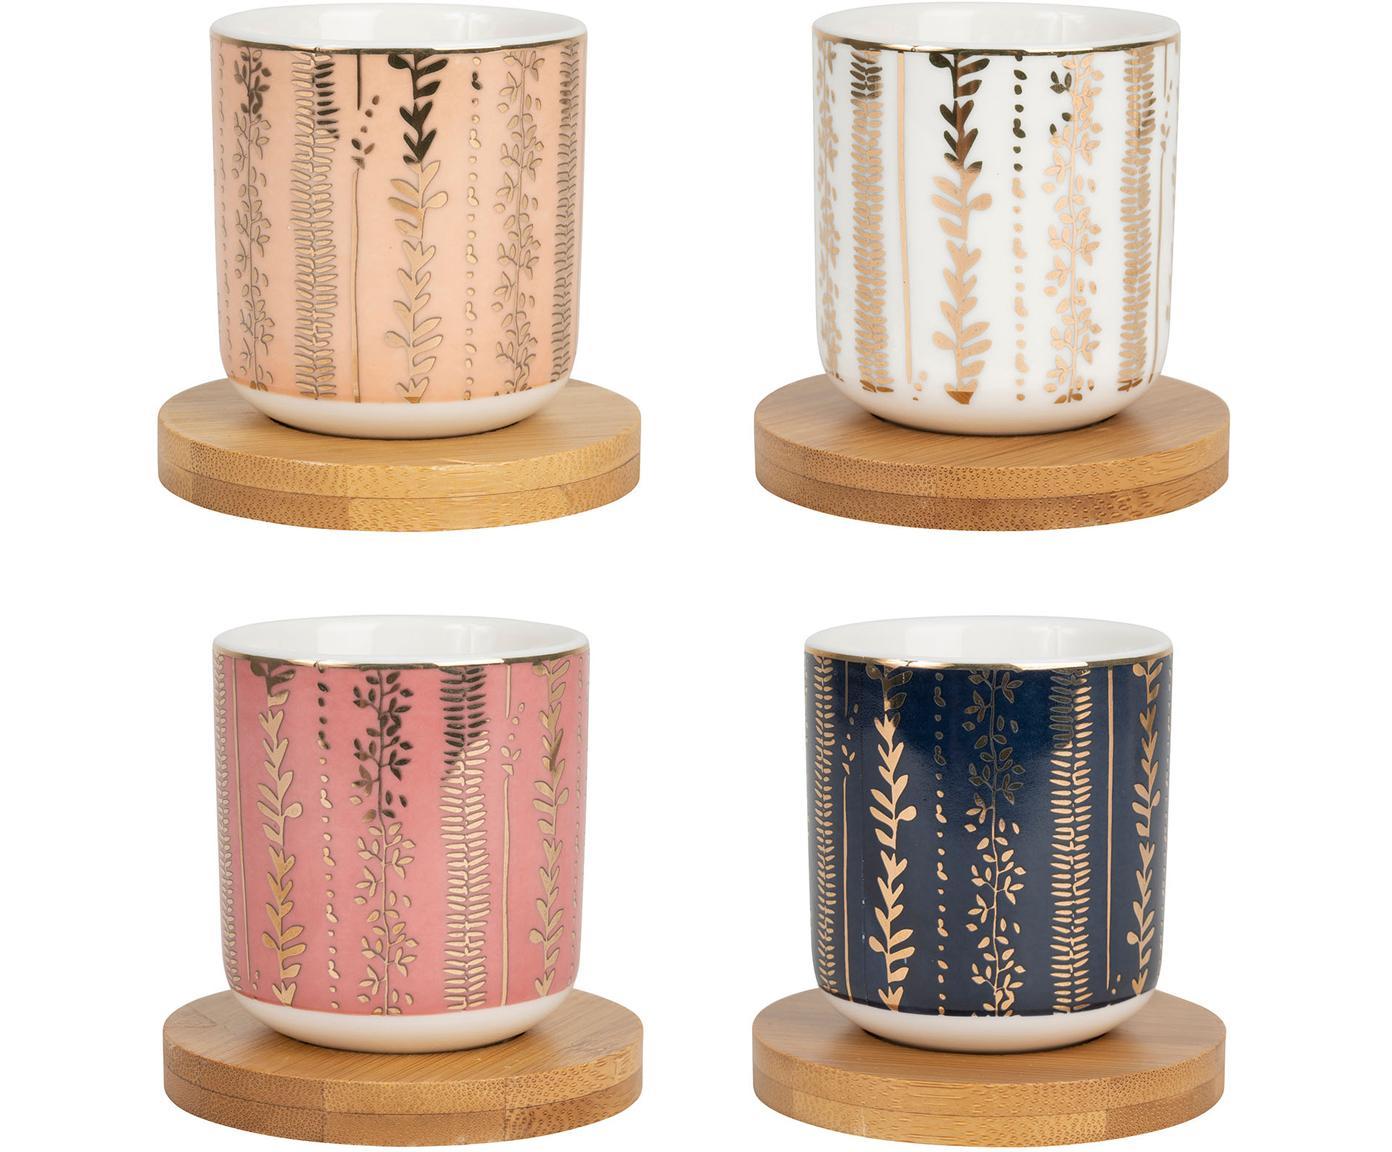 Espressobecher Veg-Gold mit Golddetails und Untersetzer, 8er-Set, Becher: Porzellan, Rosa, Blau, Weiss, Ø 6 x H 7 cm